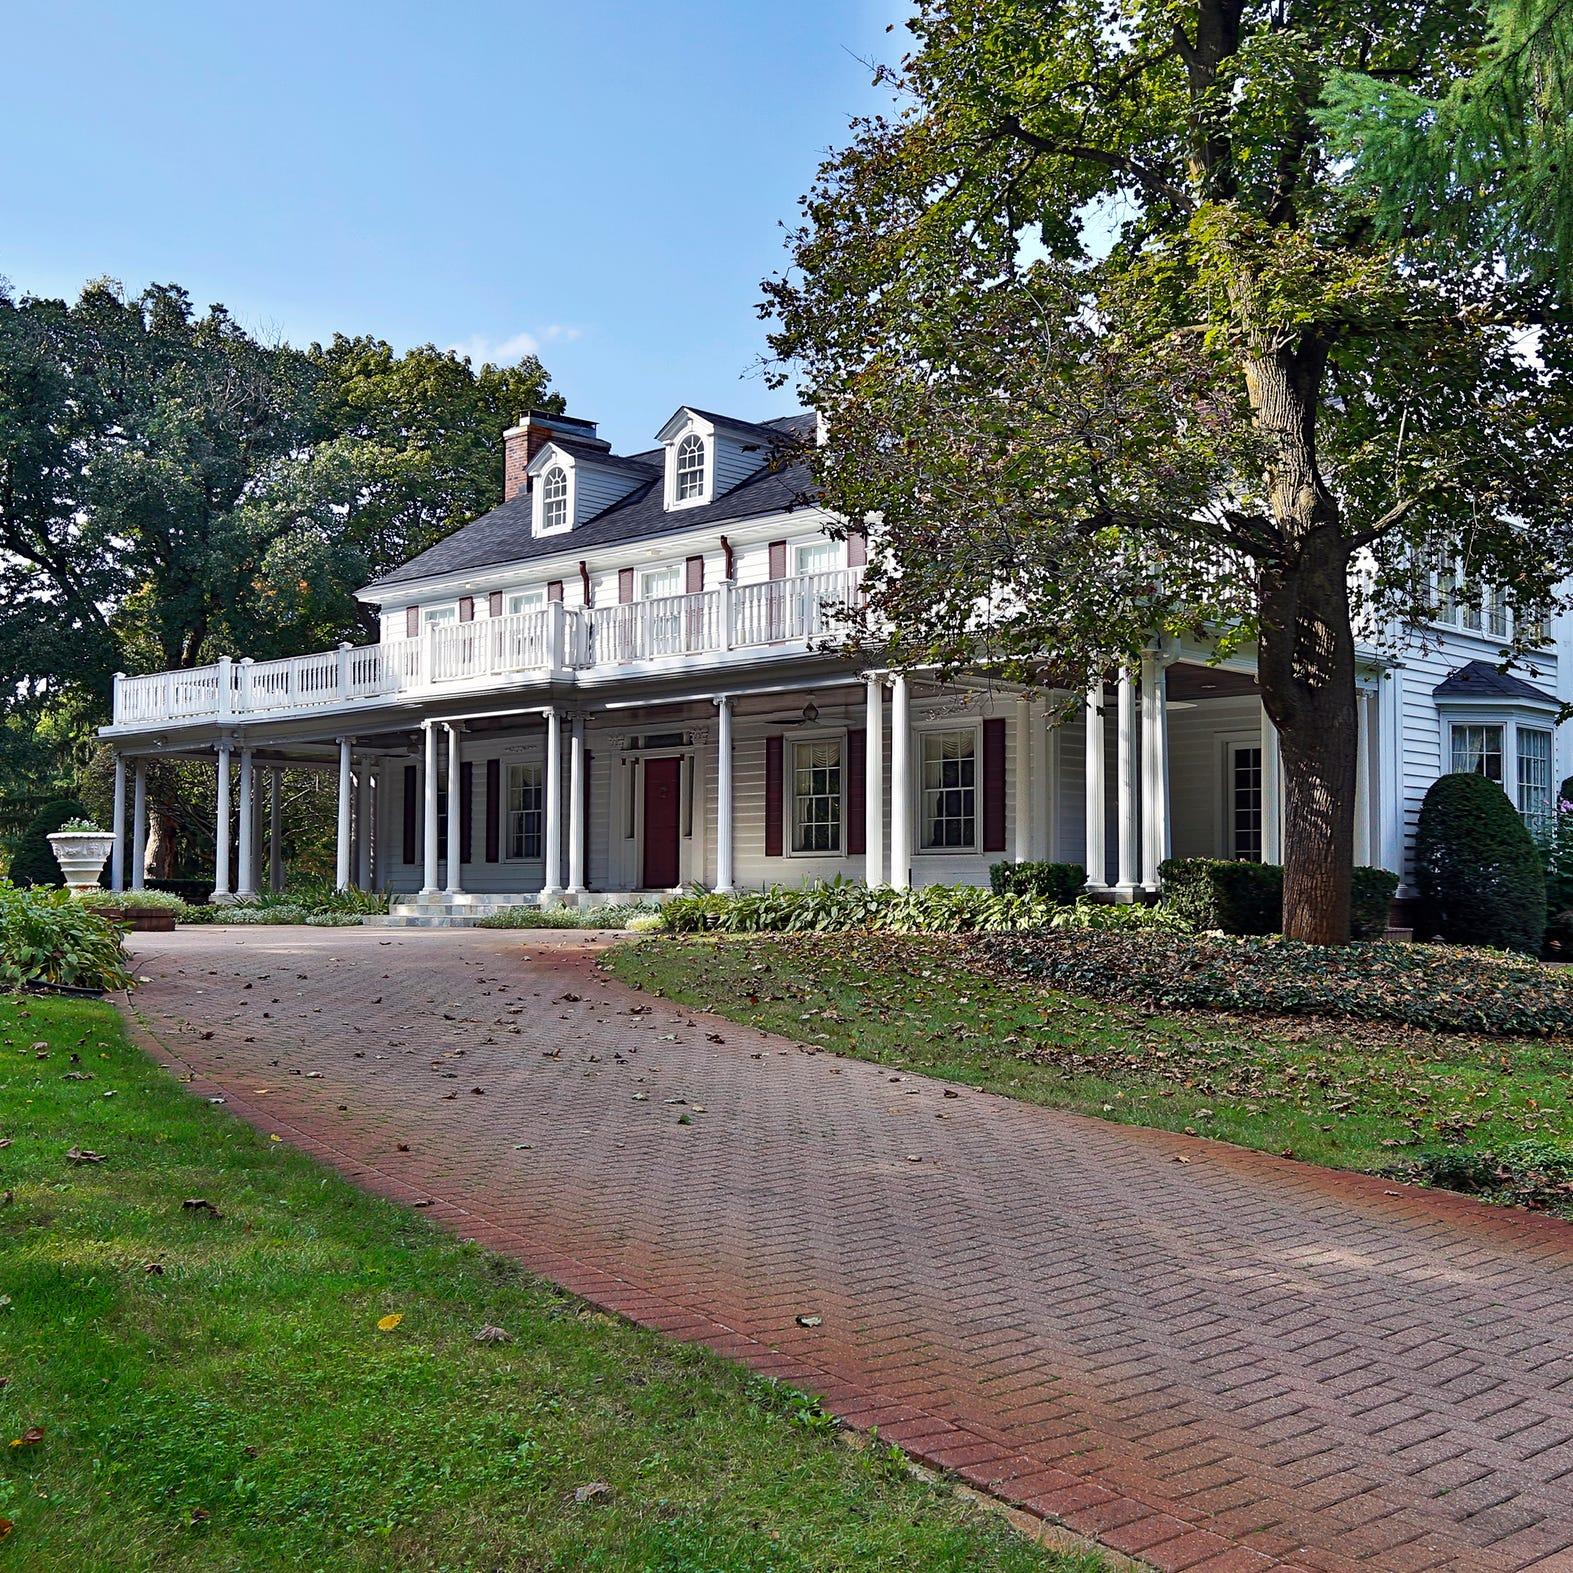 House Envy: Joe Louis was once a guest at this Novi estate